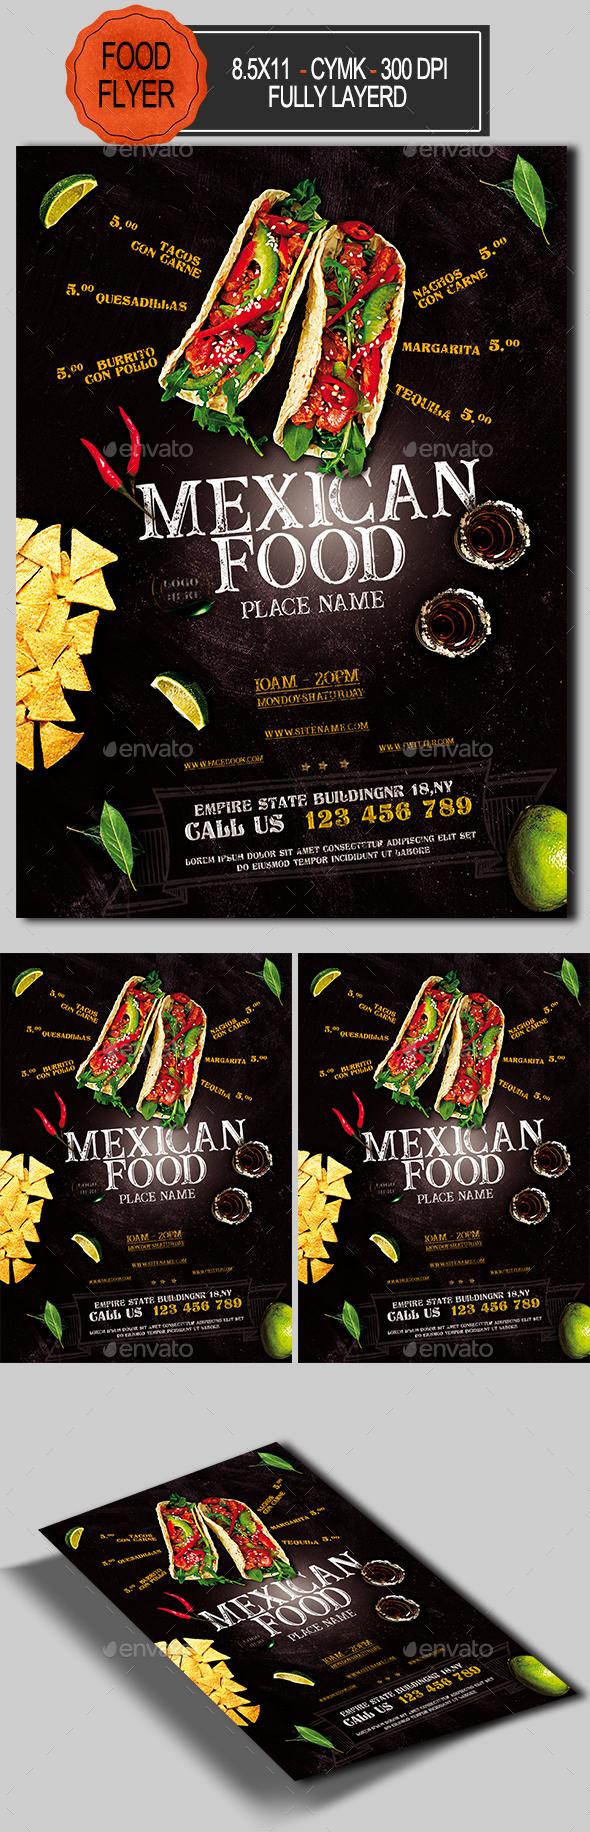 Mexican Food Flyer - Restaurant Flyers